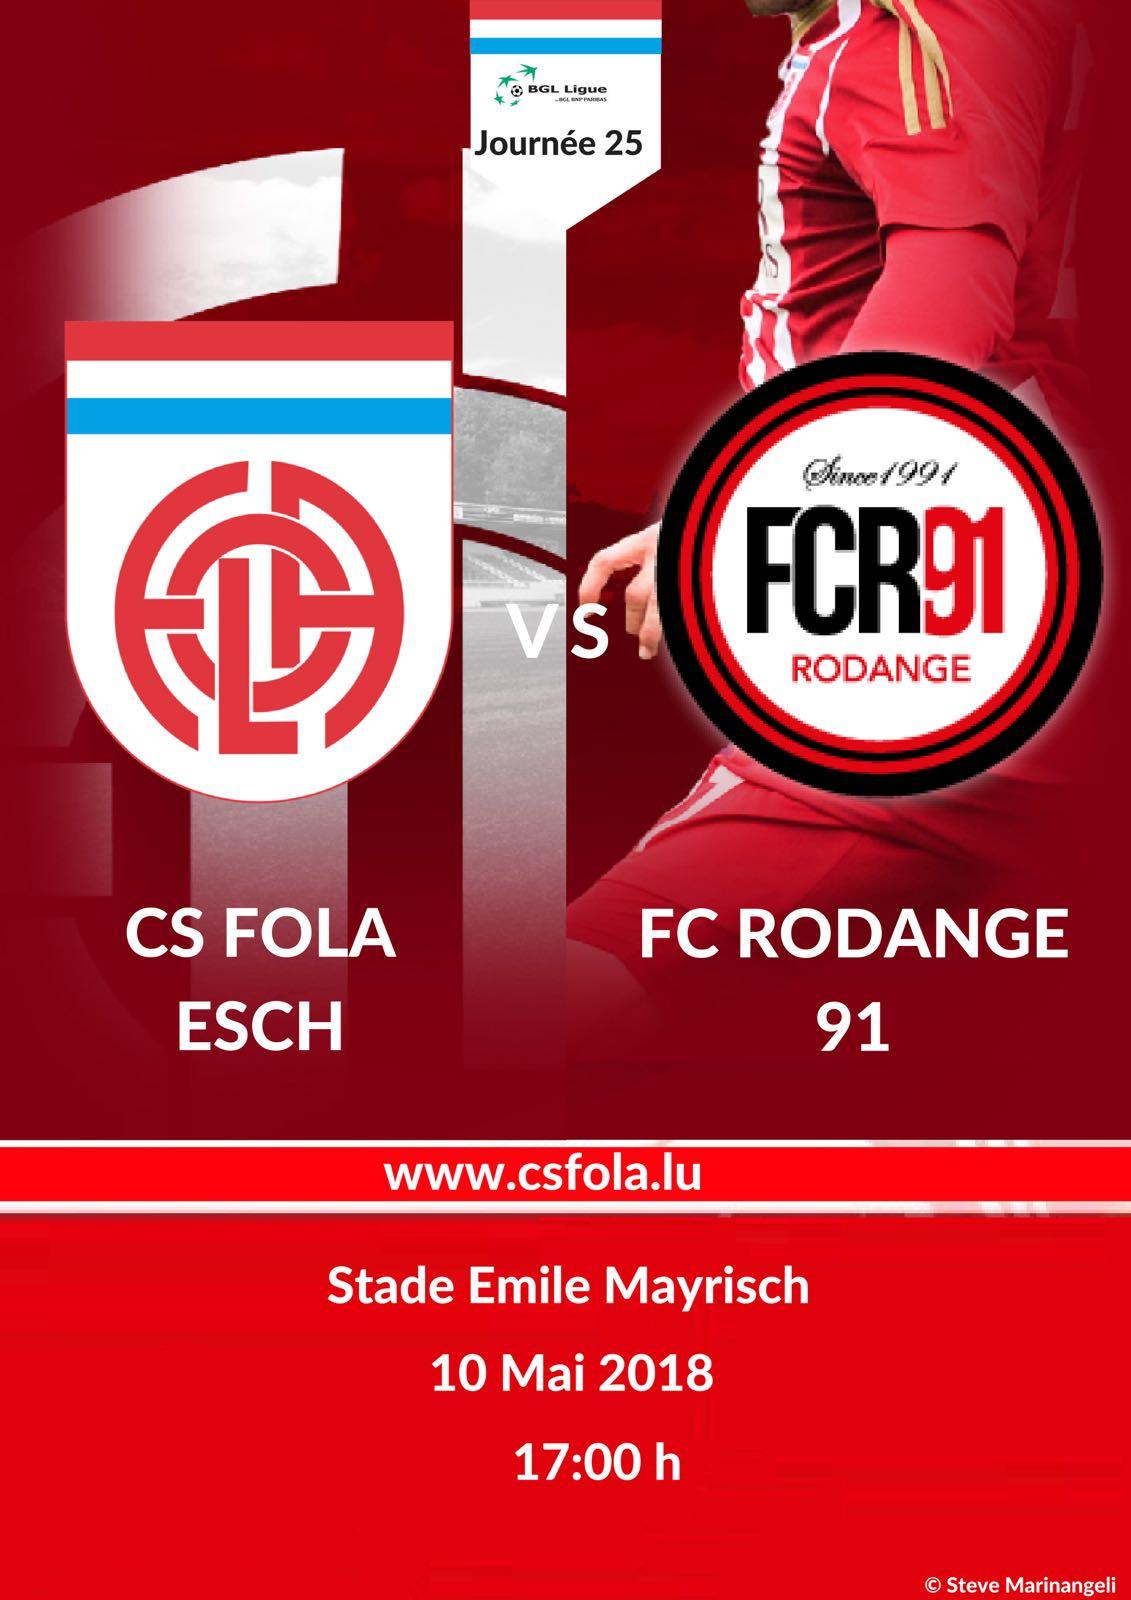 CS FOLA vs FC RODANGE